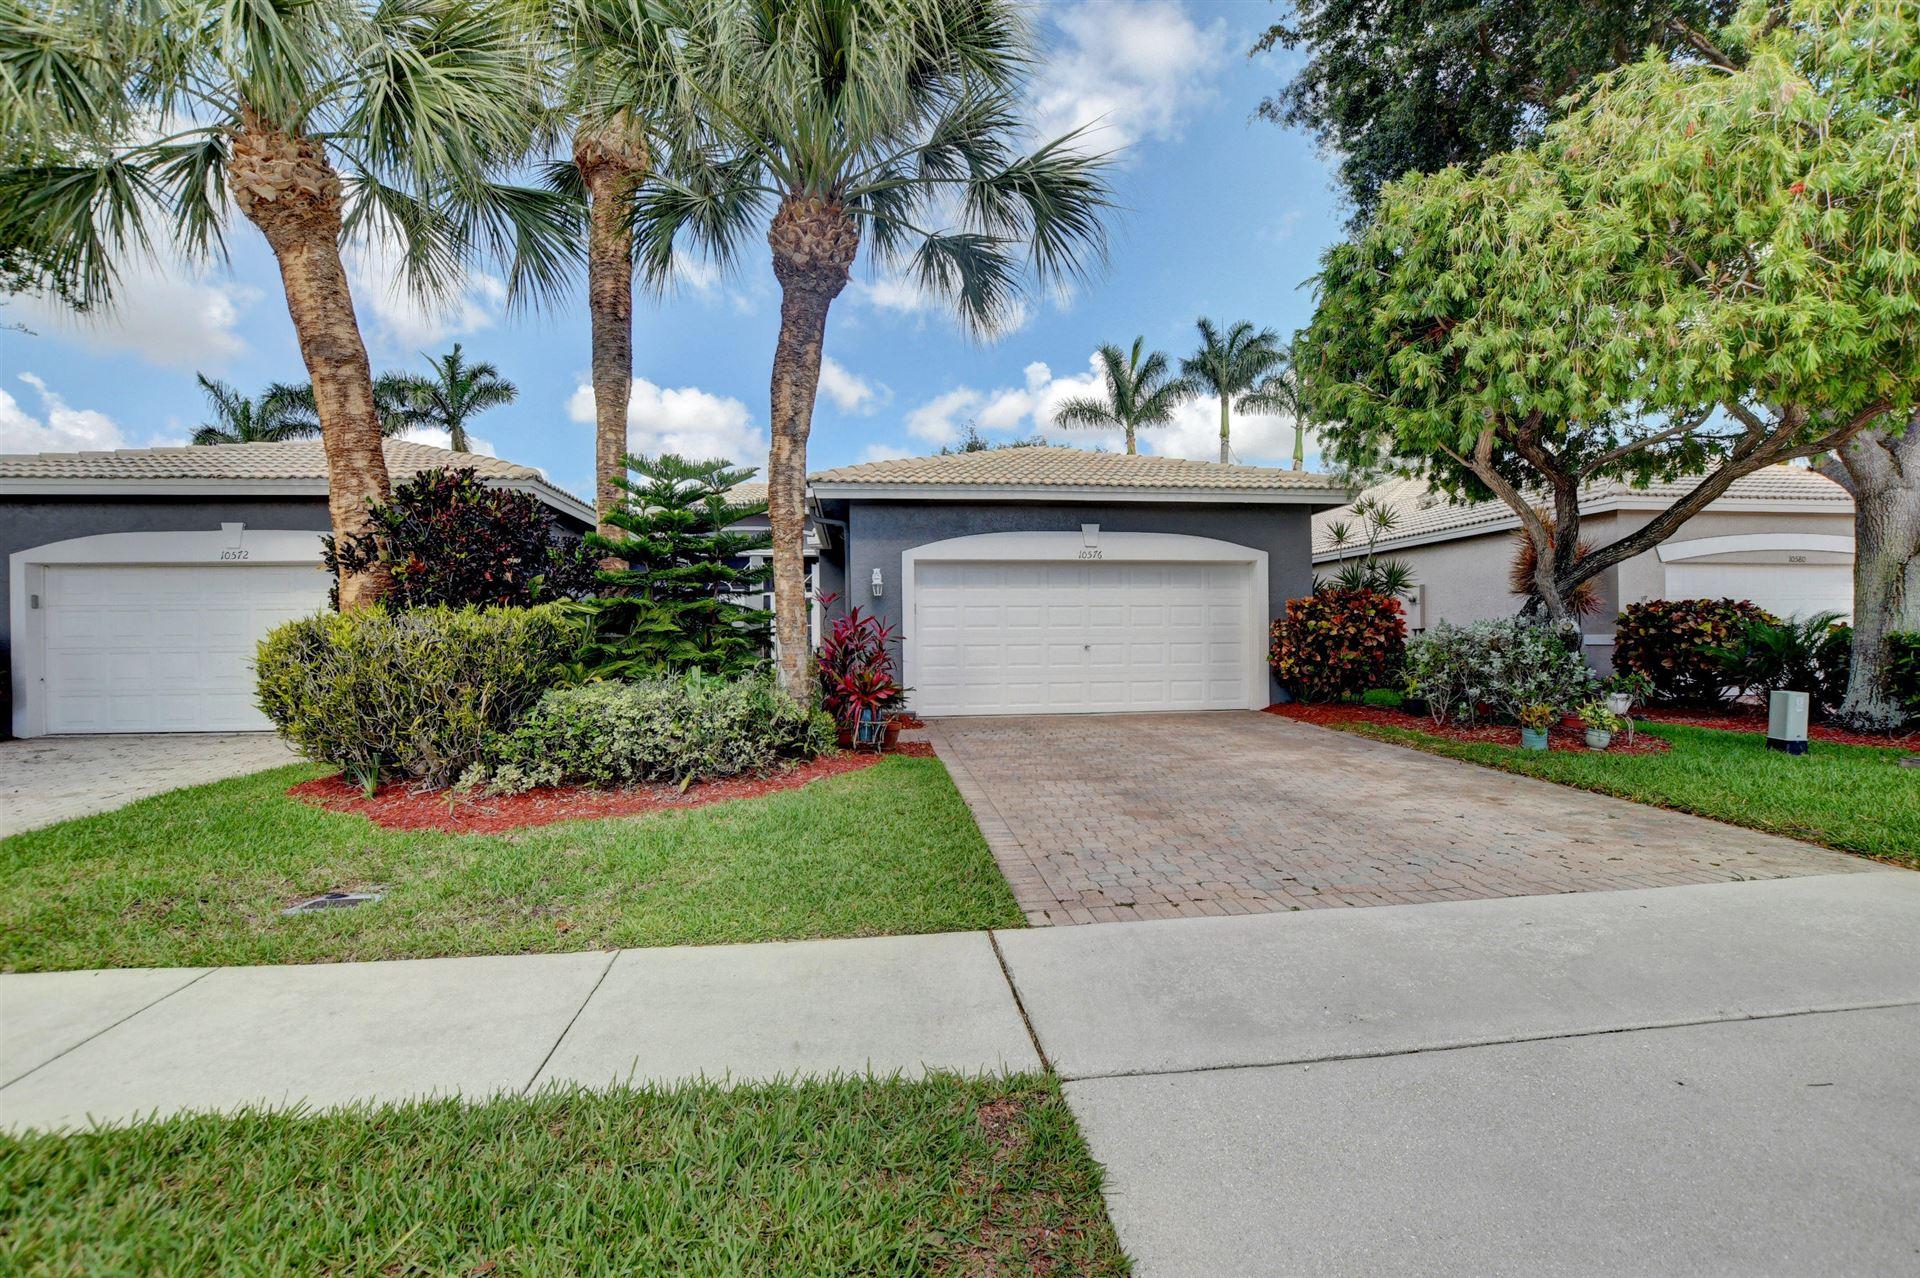 10576 Royal Caribbean Circle, Boynton Beach, FL 33437 - MLS#: RX-10716950